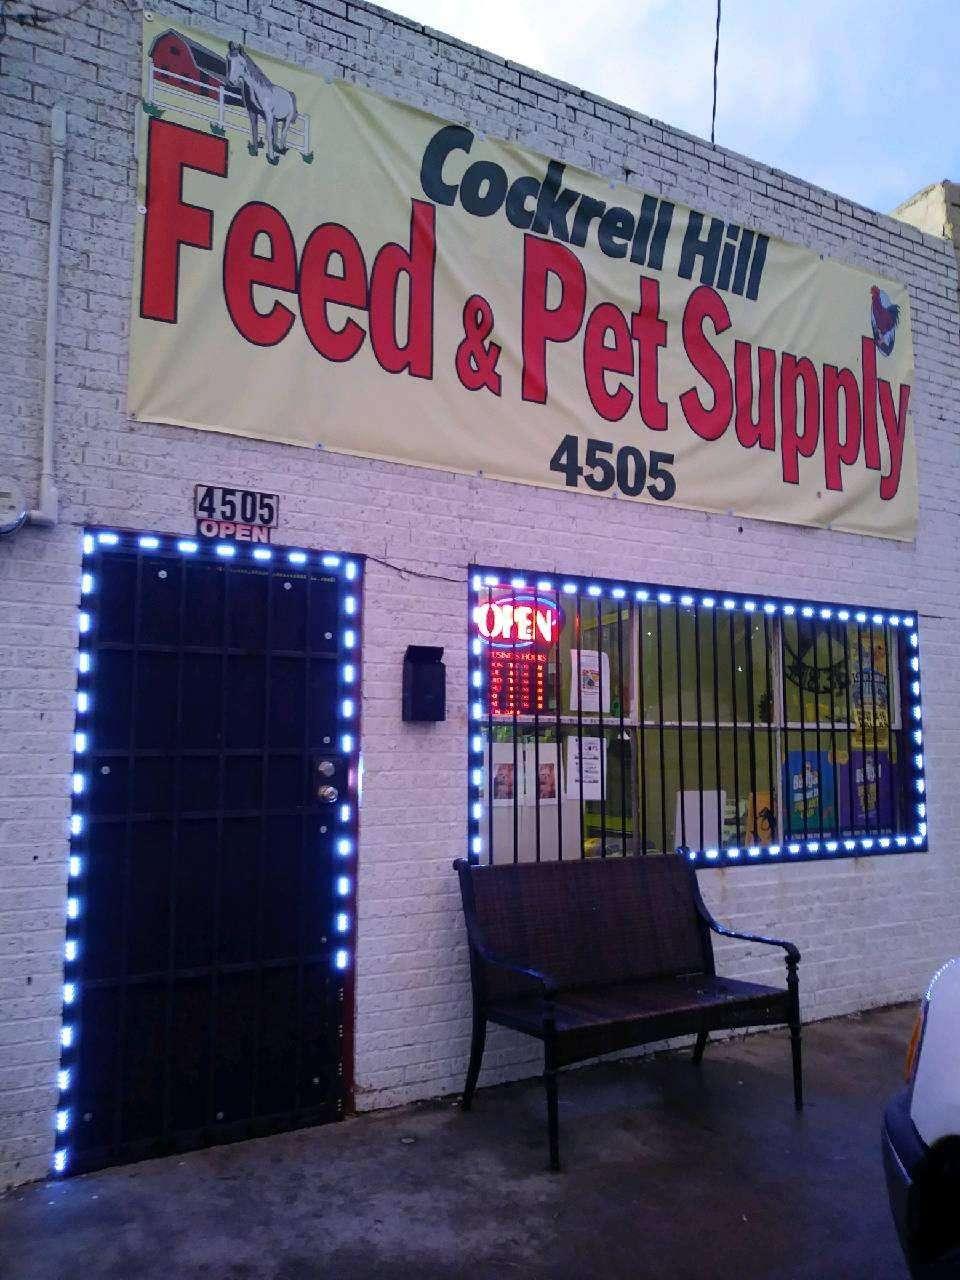 Cockrell Hill Feed & Pet Supply - store  | Photo 1 of 1 | Address: 4505 W Jefferson Blvd, Dallas, TX 75211, USA | Phone: (214) 646-4520